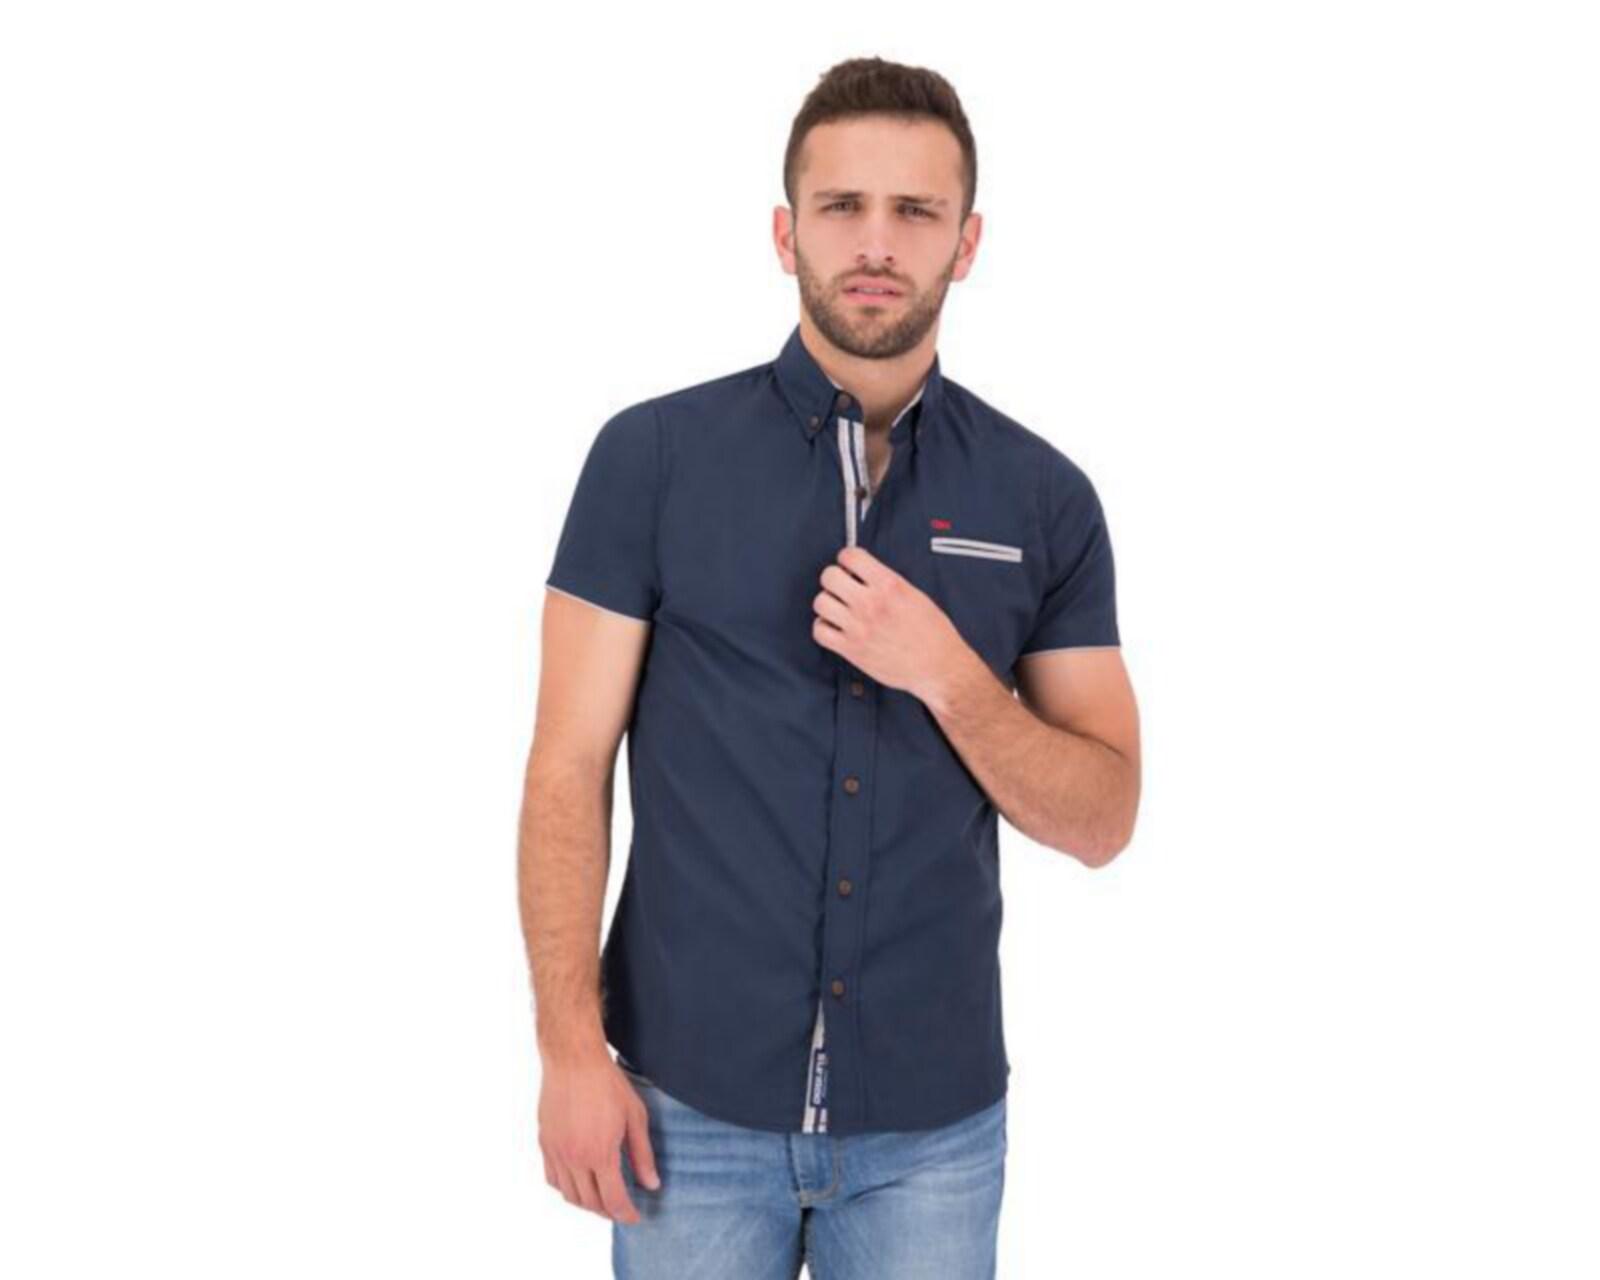 Camisa Manga Corta color Azul marca Oggi para Hombre